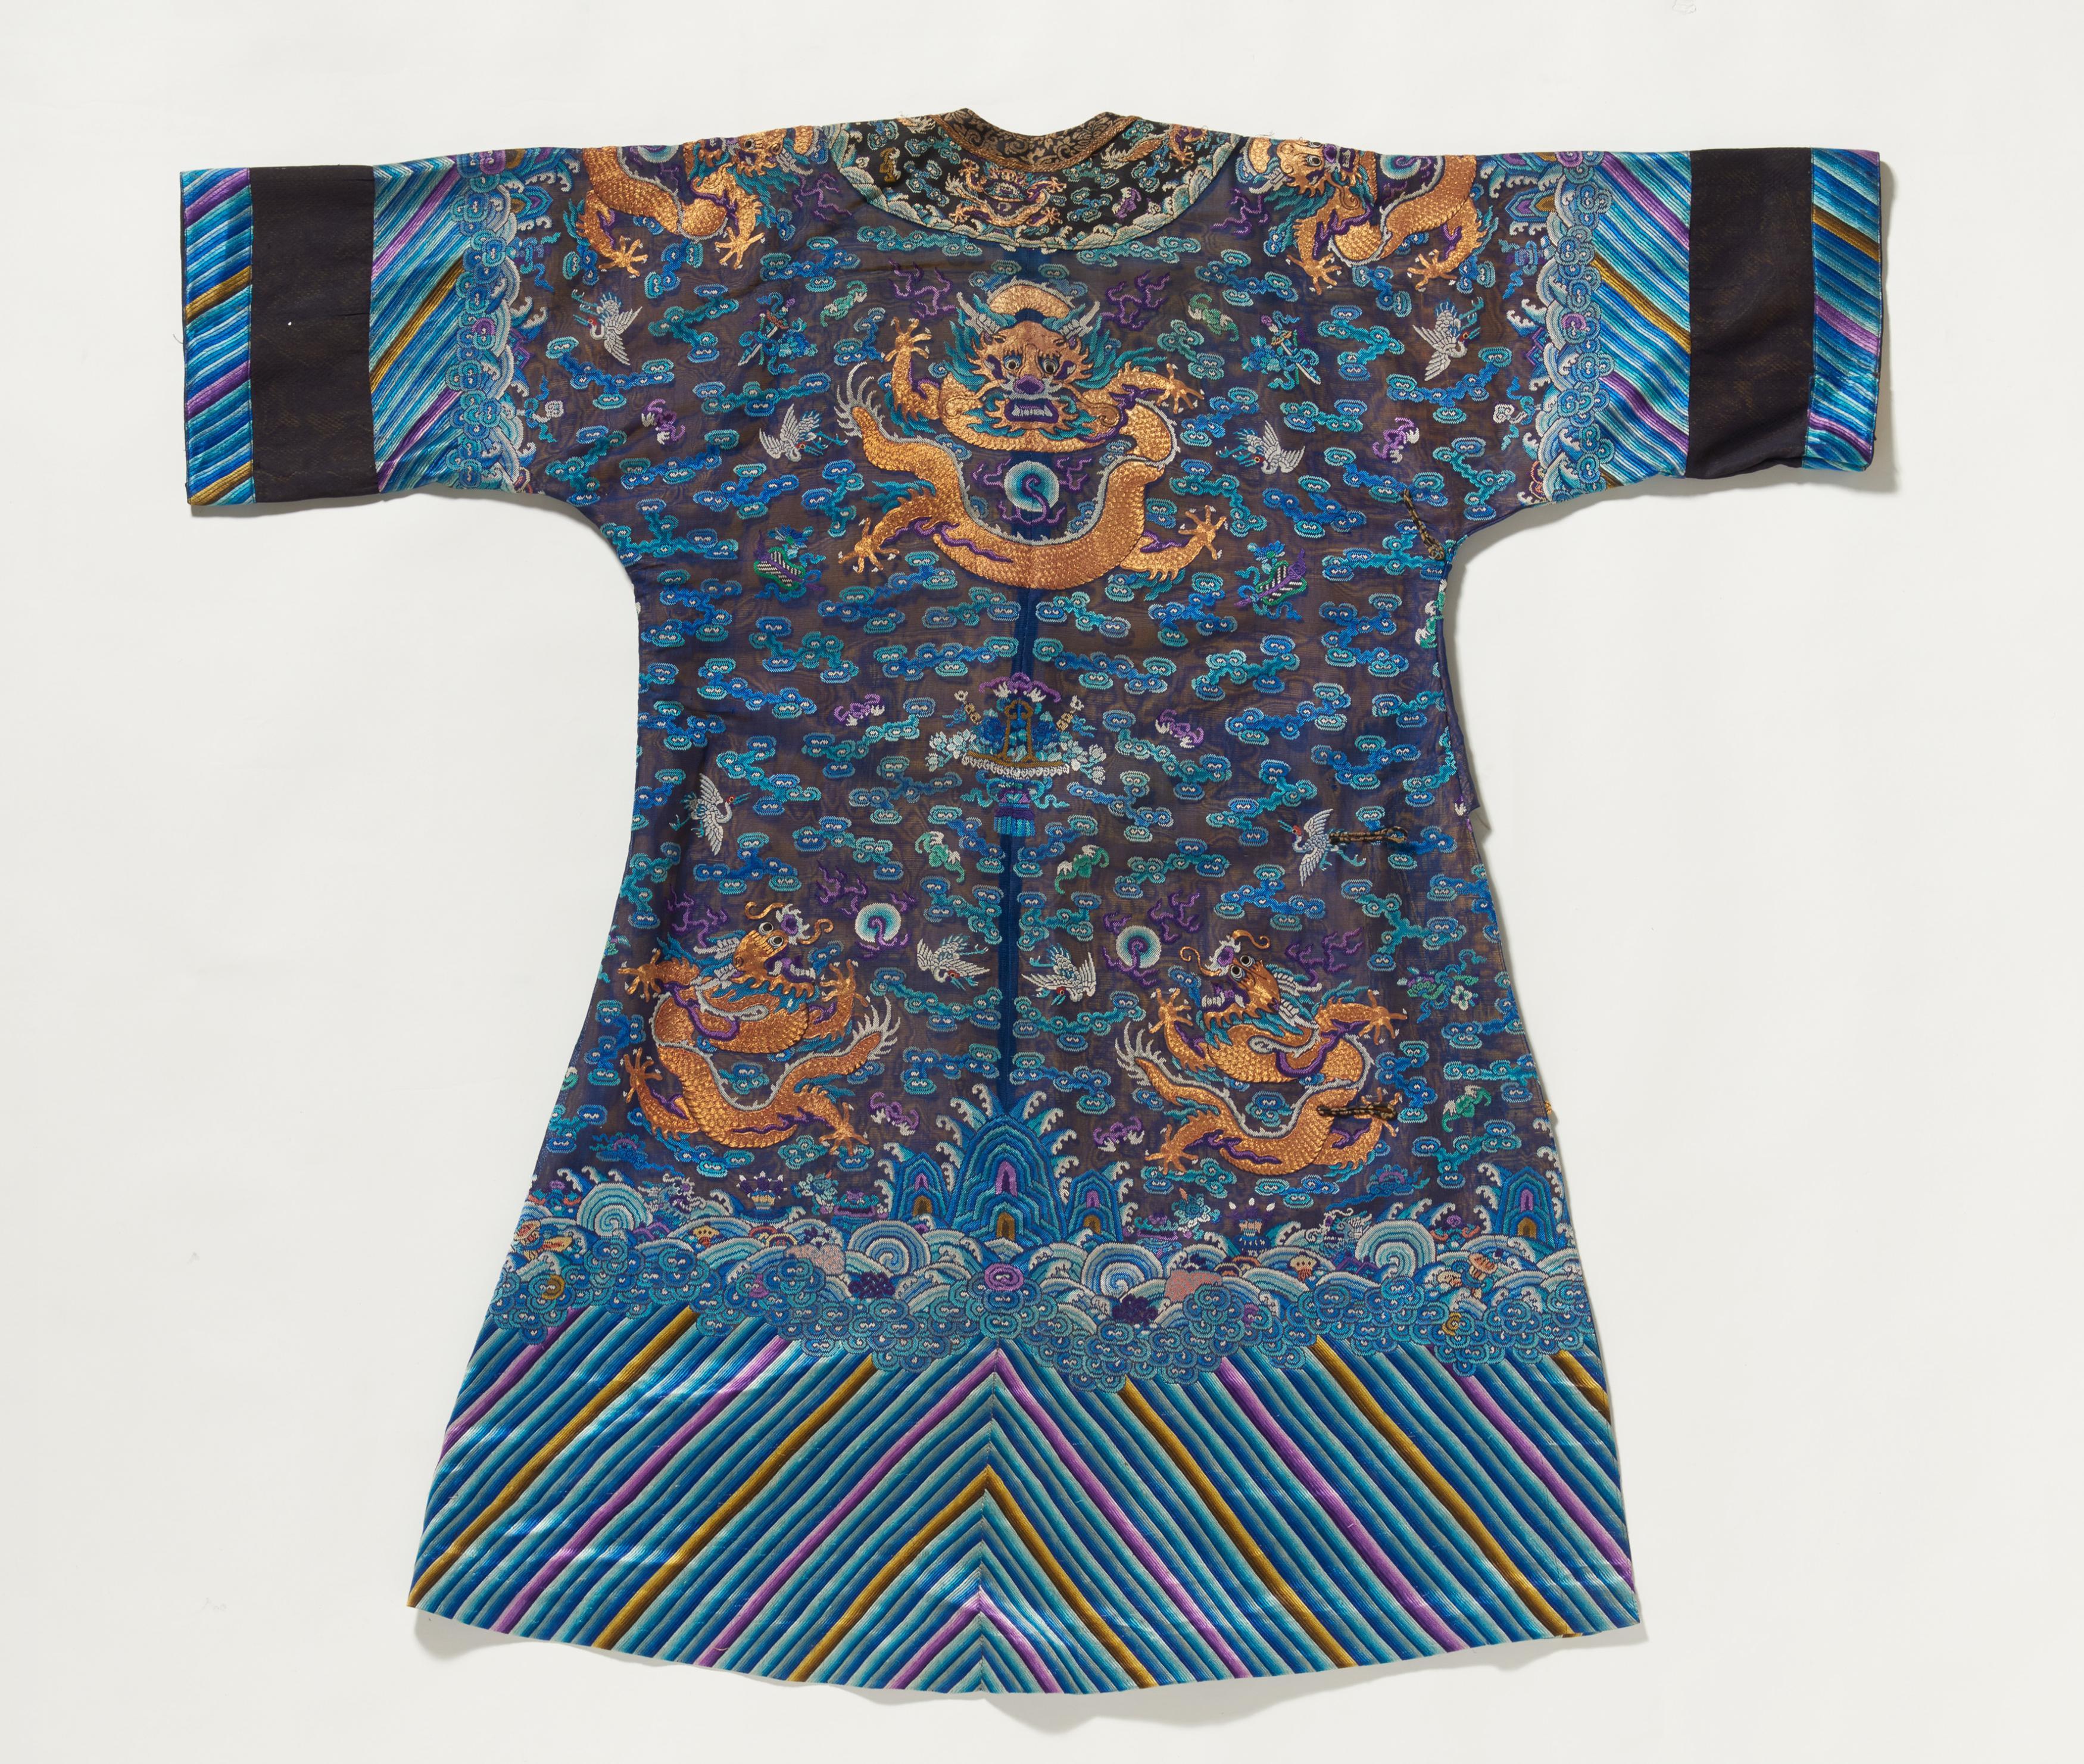 Lot 17 - BLUE DRAGON ROBE FOR MIDSUMMER. Origin: China. Dynasty: Qing dynasty. Date: 19th-early 20th c.